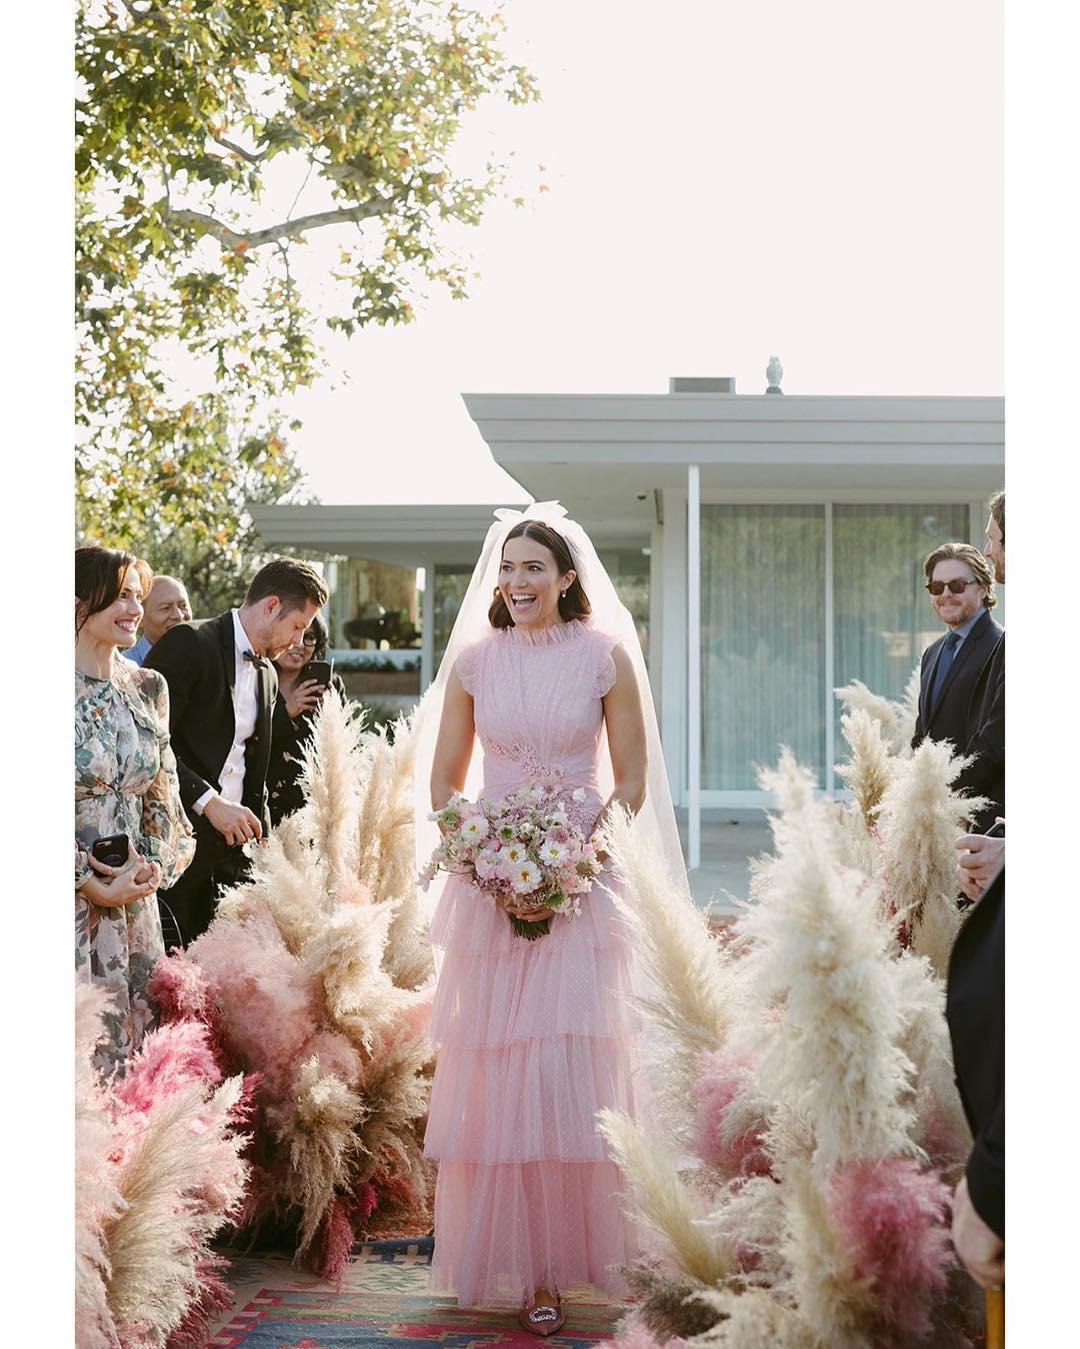 mandy moore pink wedding dress